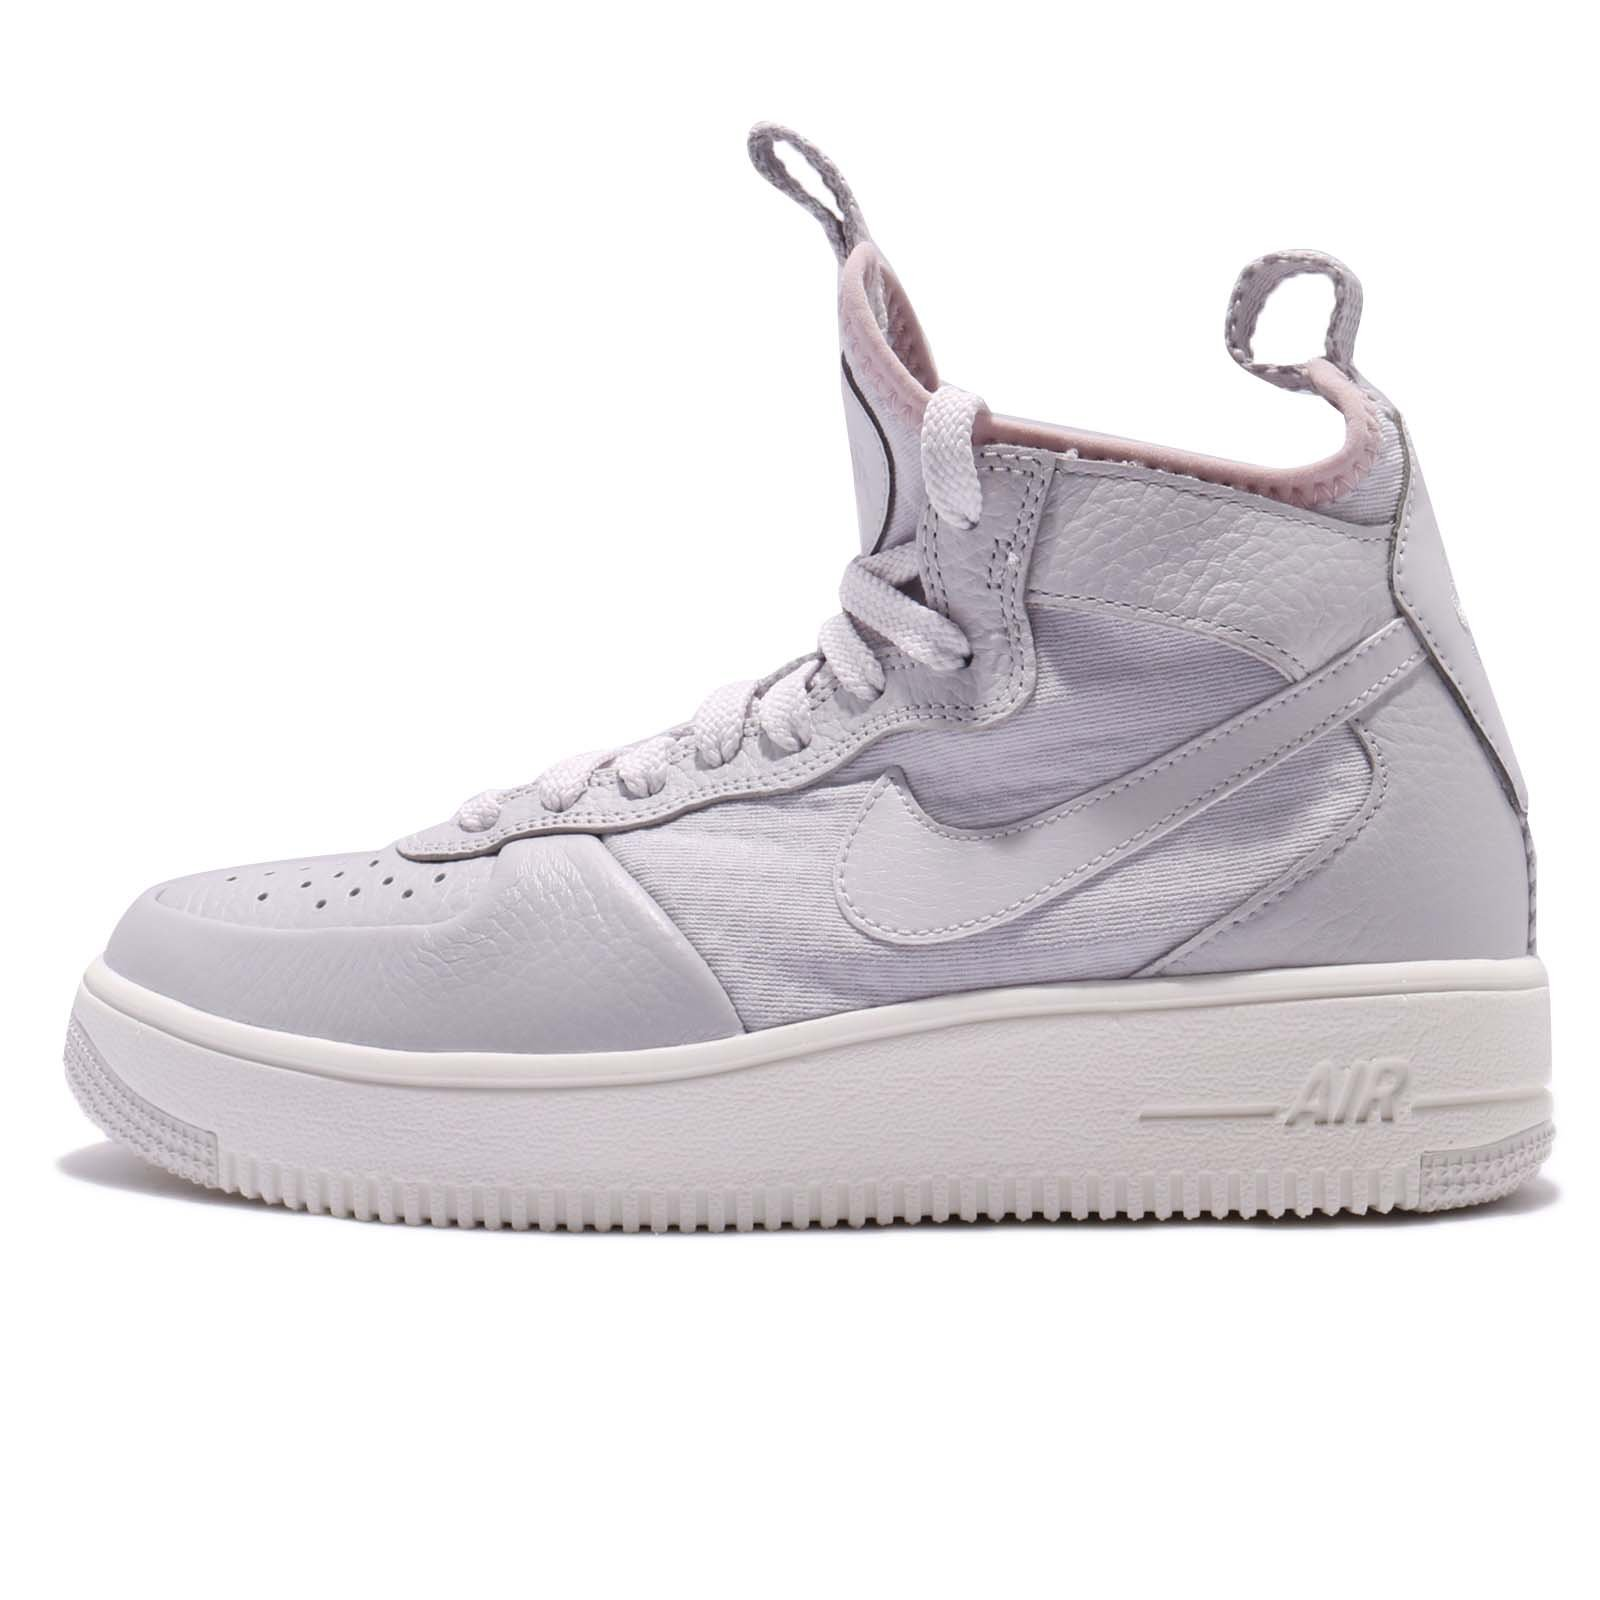 Nike W Air Force 1 Ultraforce Mid Womens Vast Grey/Vast Grey 7.5 M US by Nike